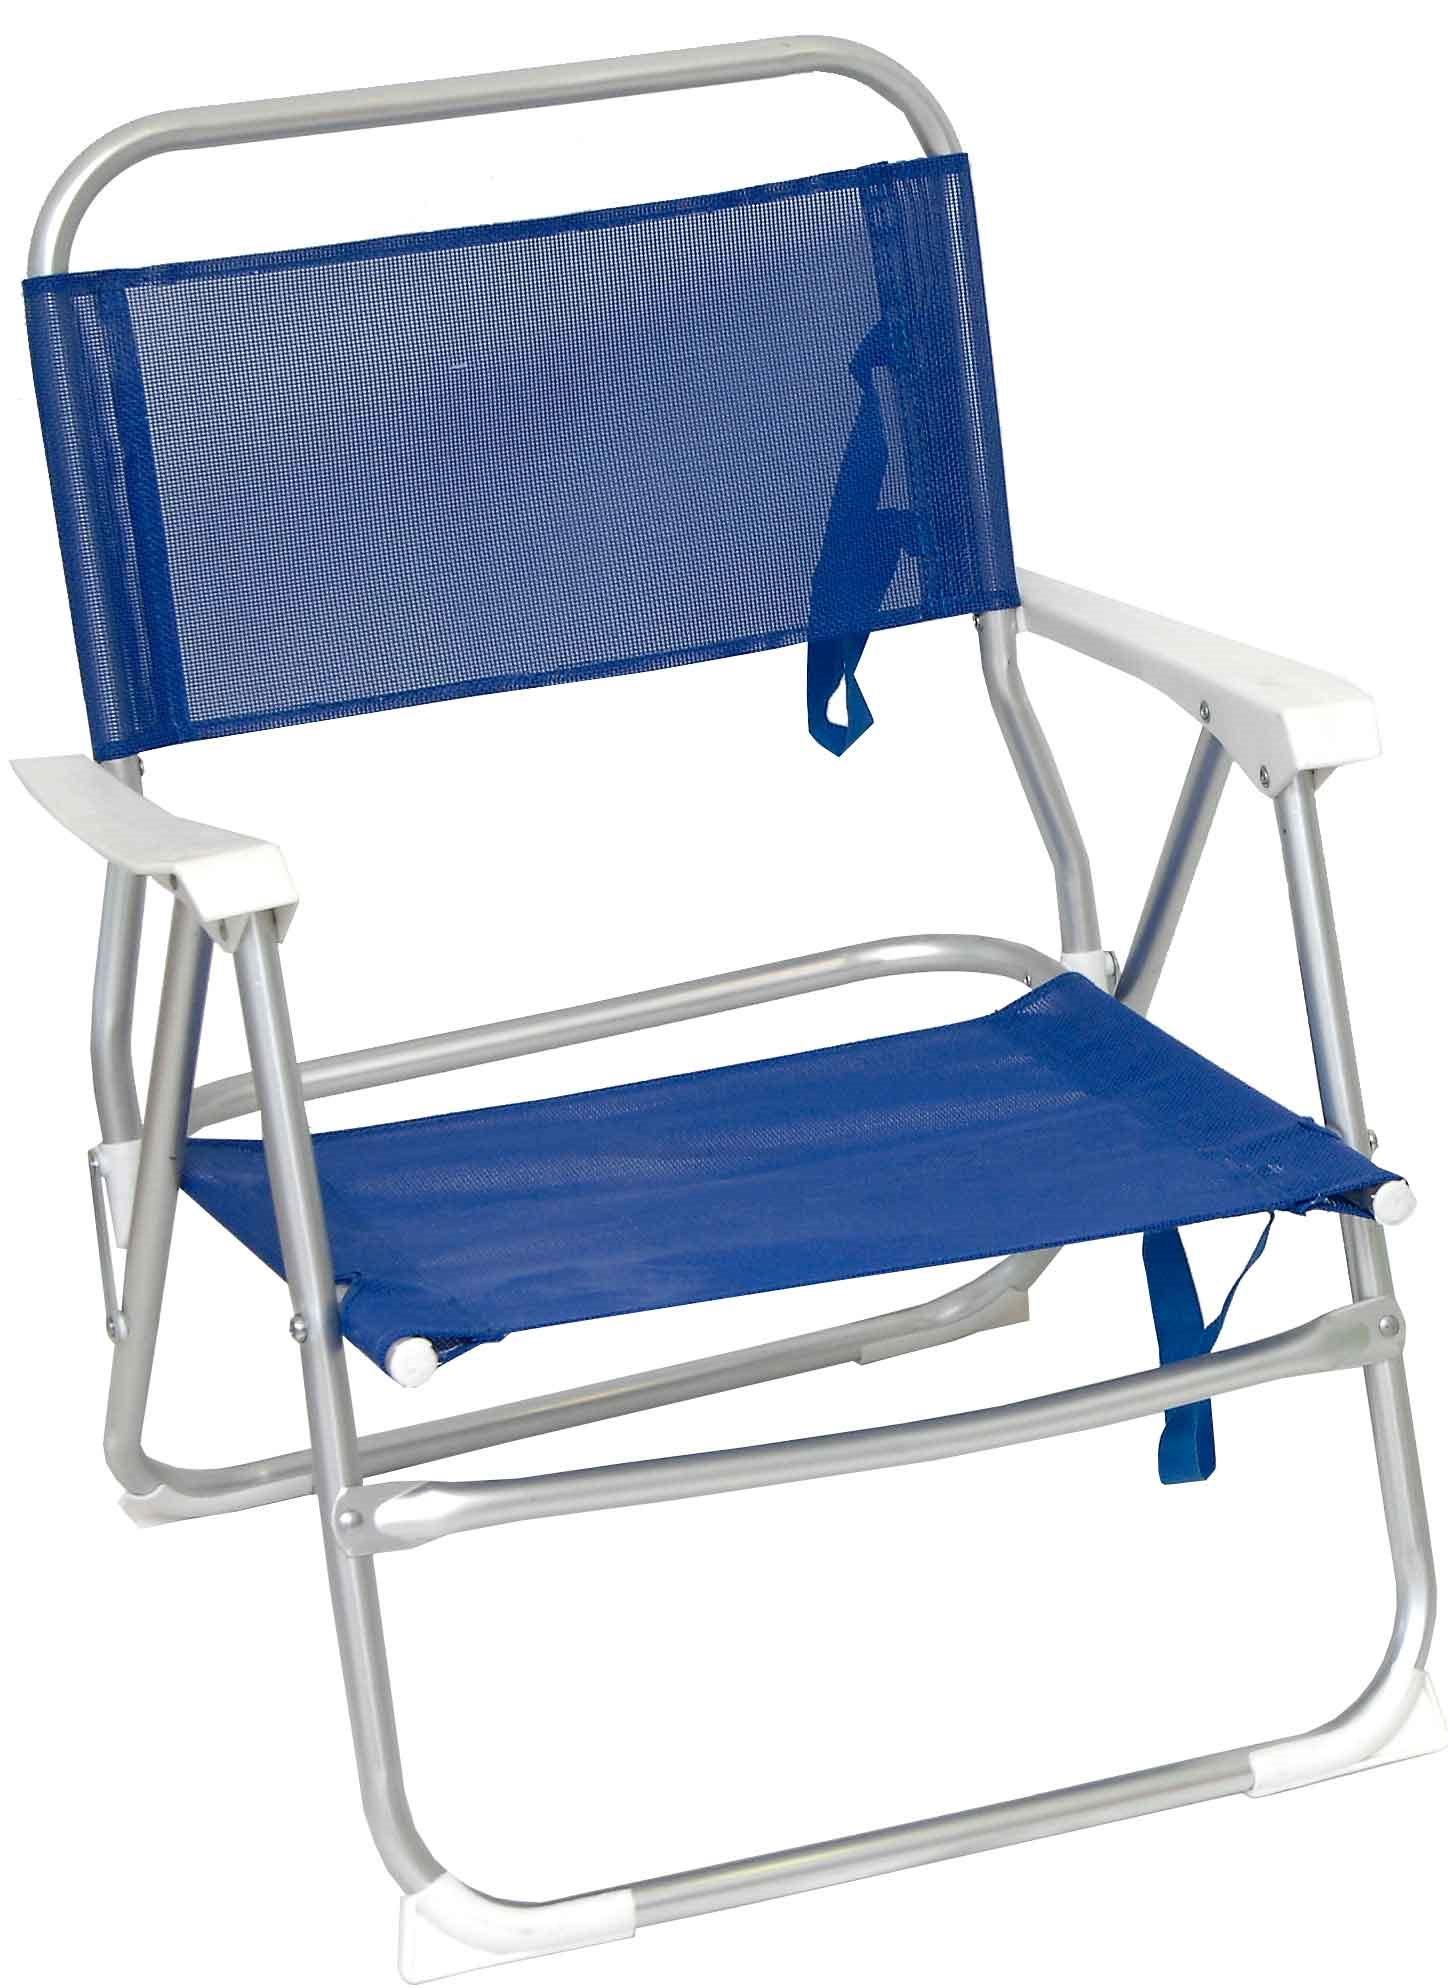 Campus καρέκλα παραλίας αλουμινίου μπλε με μπράτσα